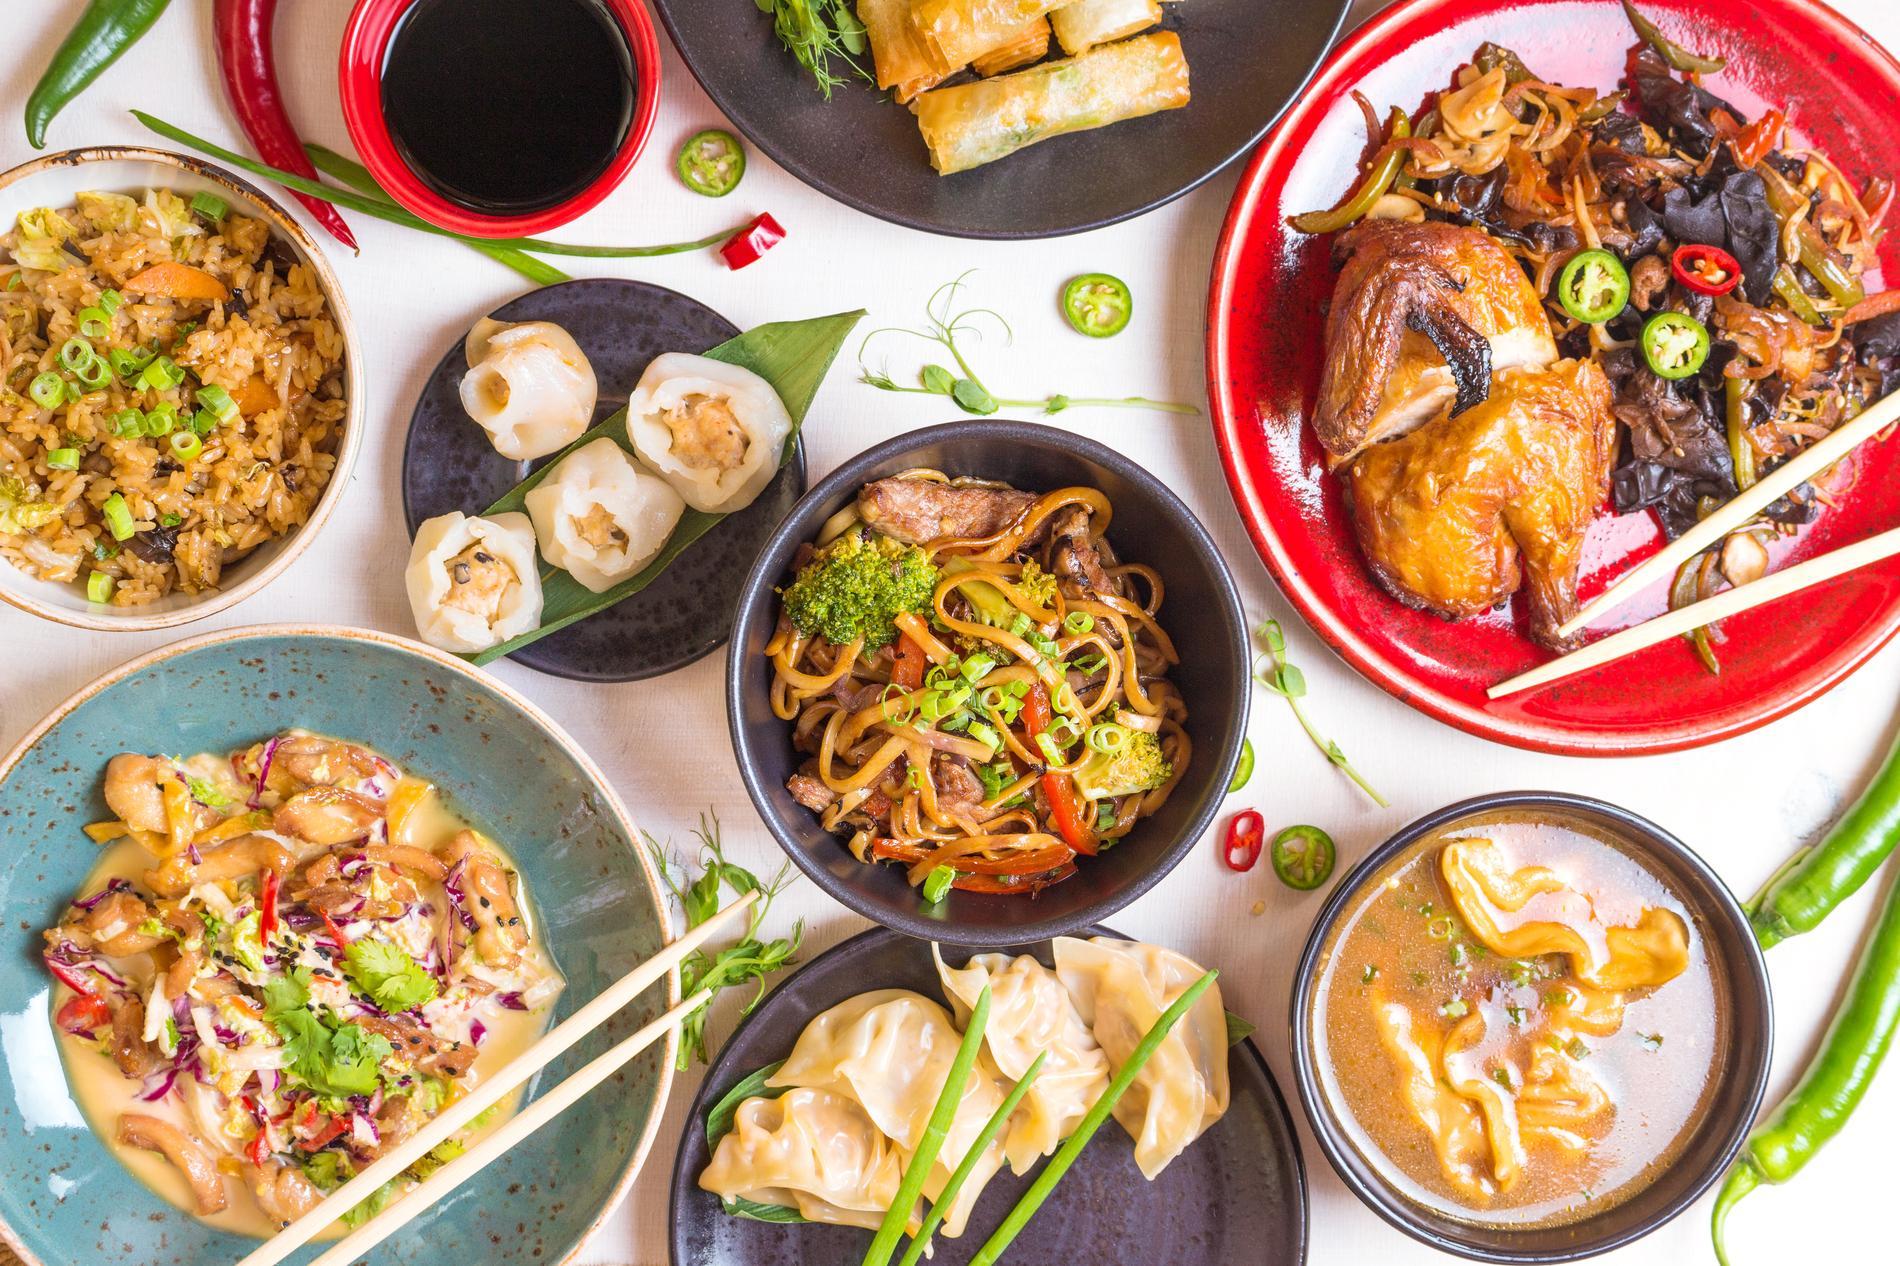 recettes cuisine asiatique recettes faciles et rapides cuisine madame figaro. Black Bedroom Furniture Sets. Home Design Ideas